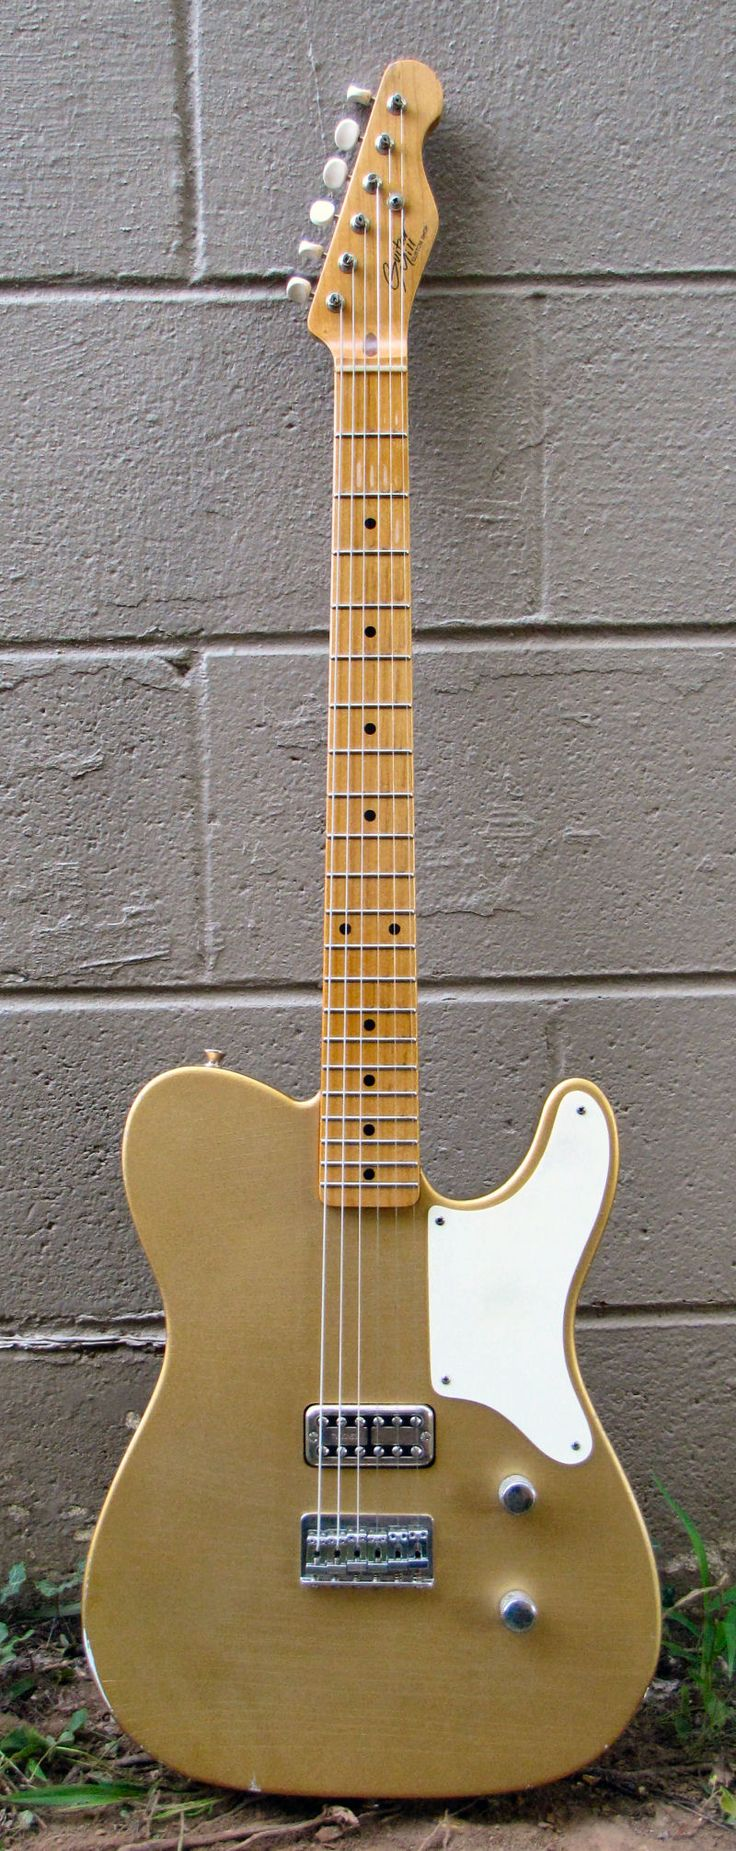 Mario Guitars - El Chupacabra  => Mario Martin, Murfreesboro , Tennessee, USA